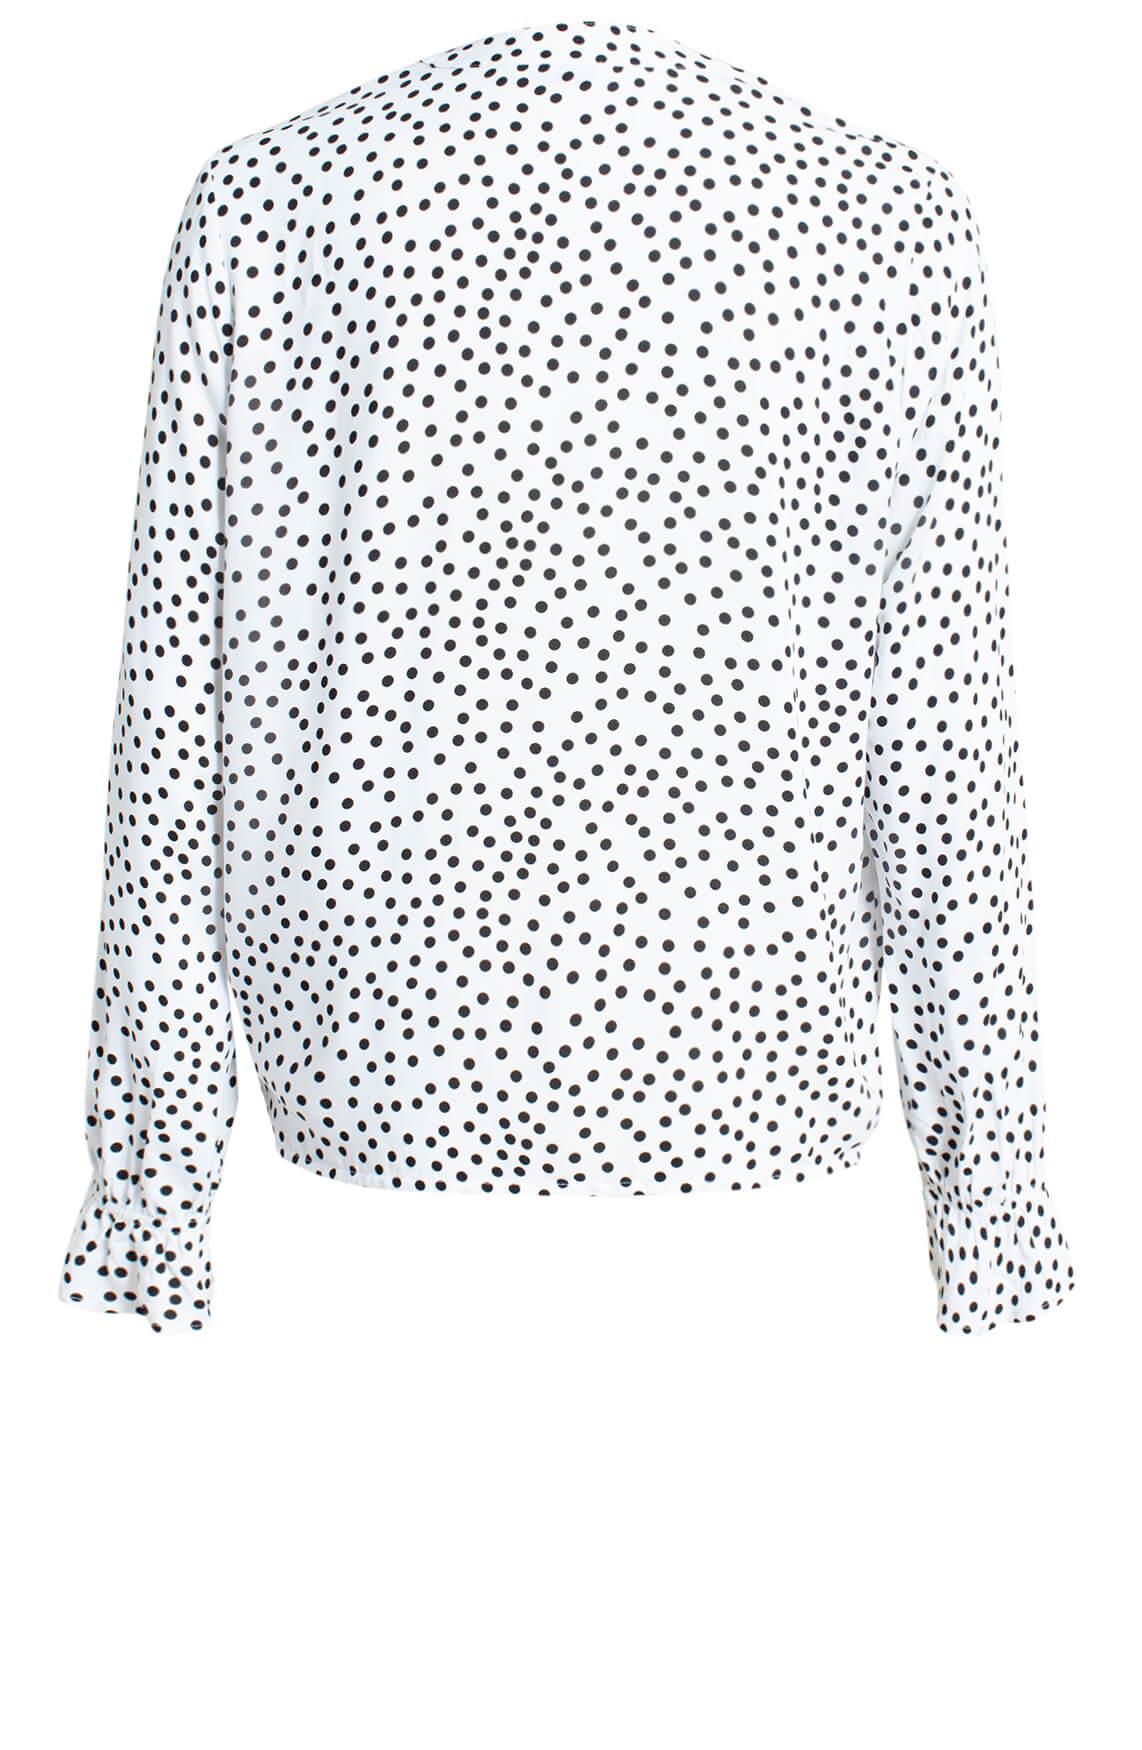 Anna Dames Gestippelde blouse wit